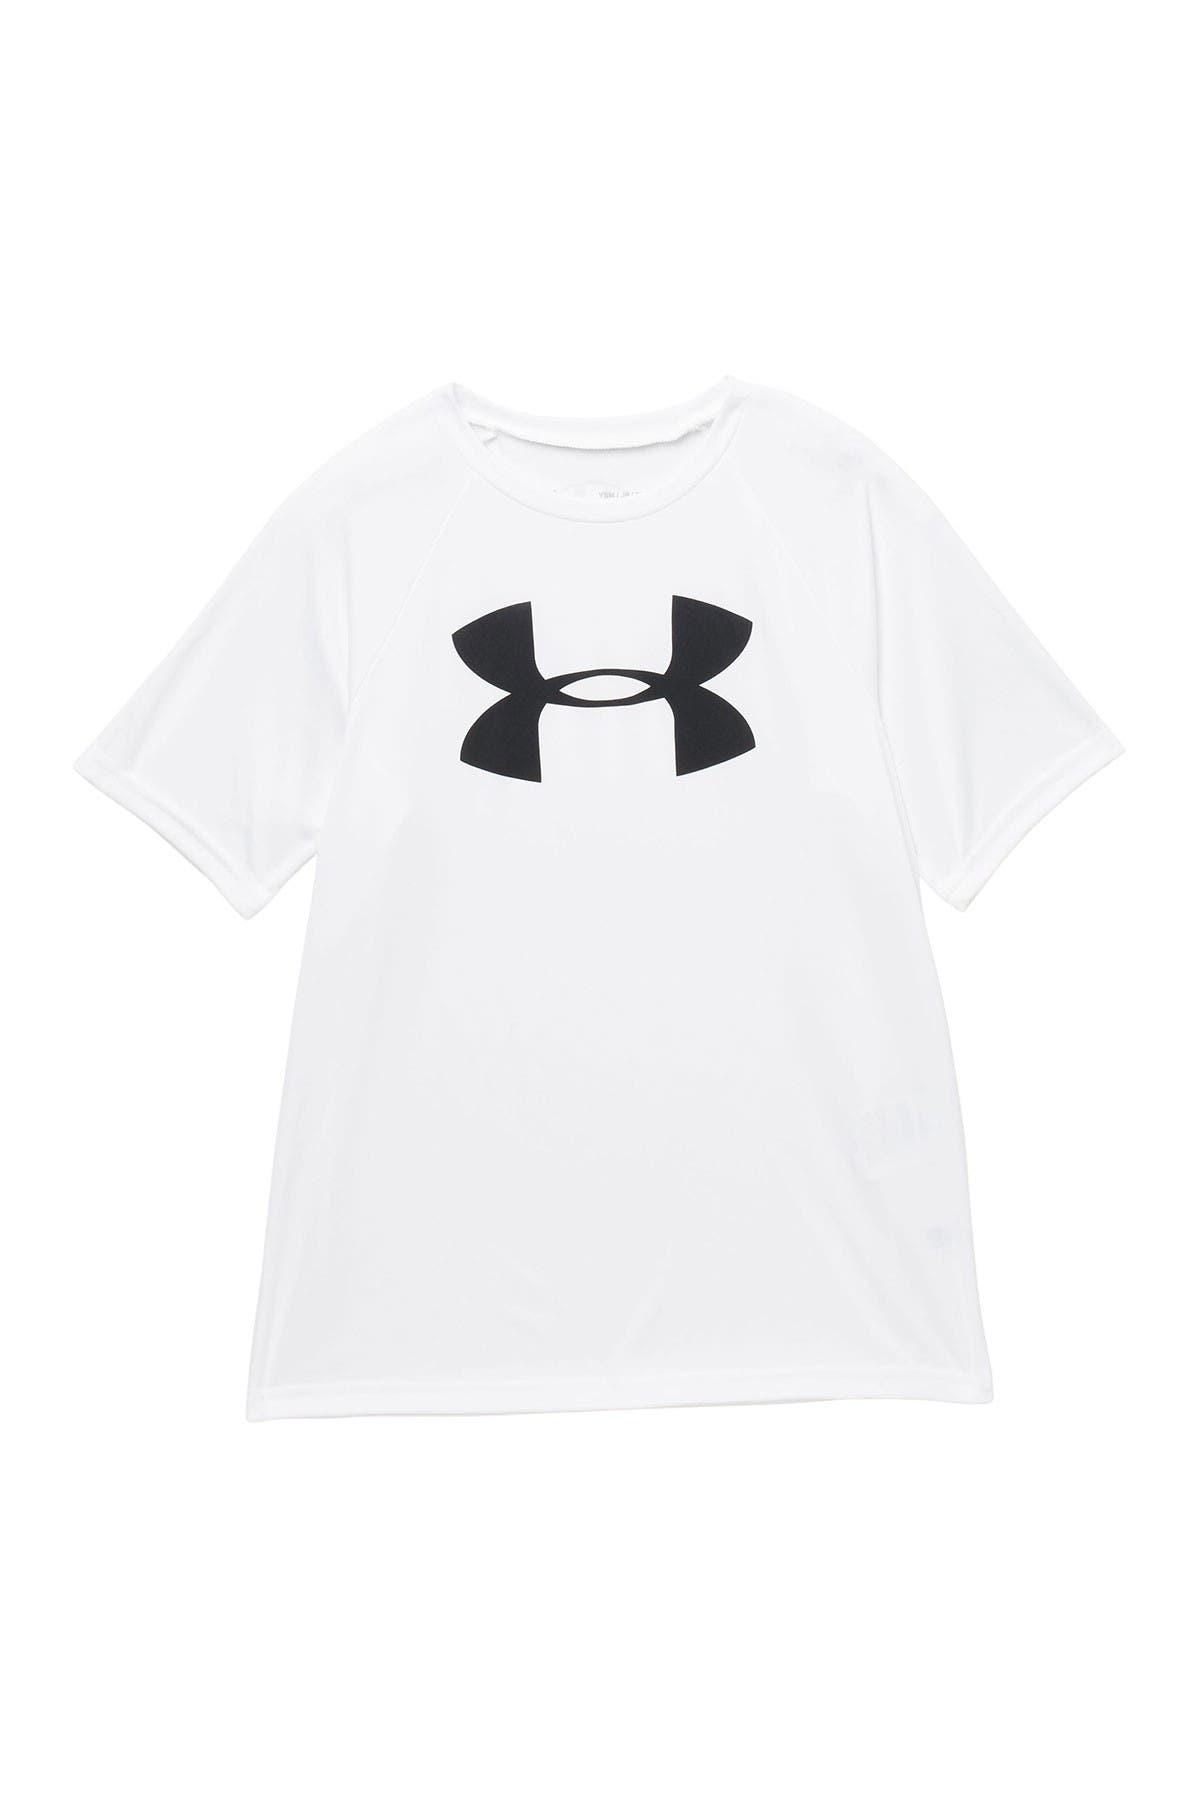 Image of Under Armour Tech Logo Shirt